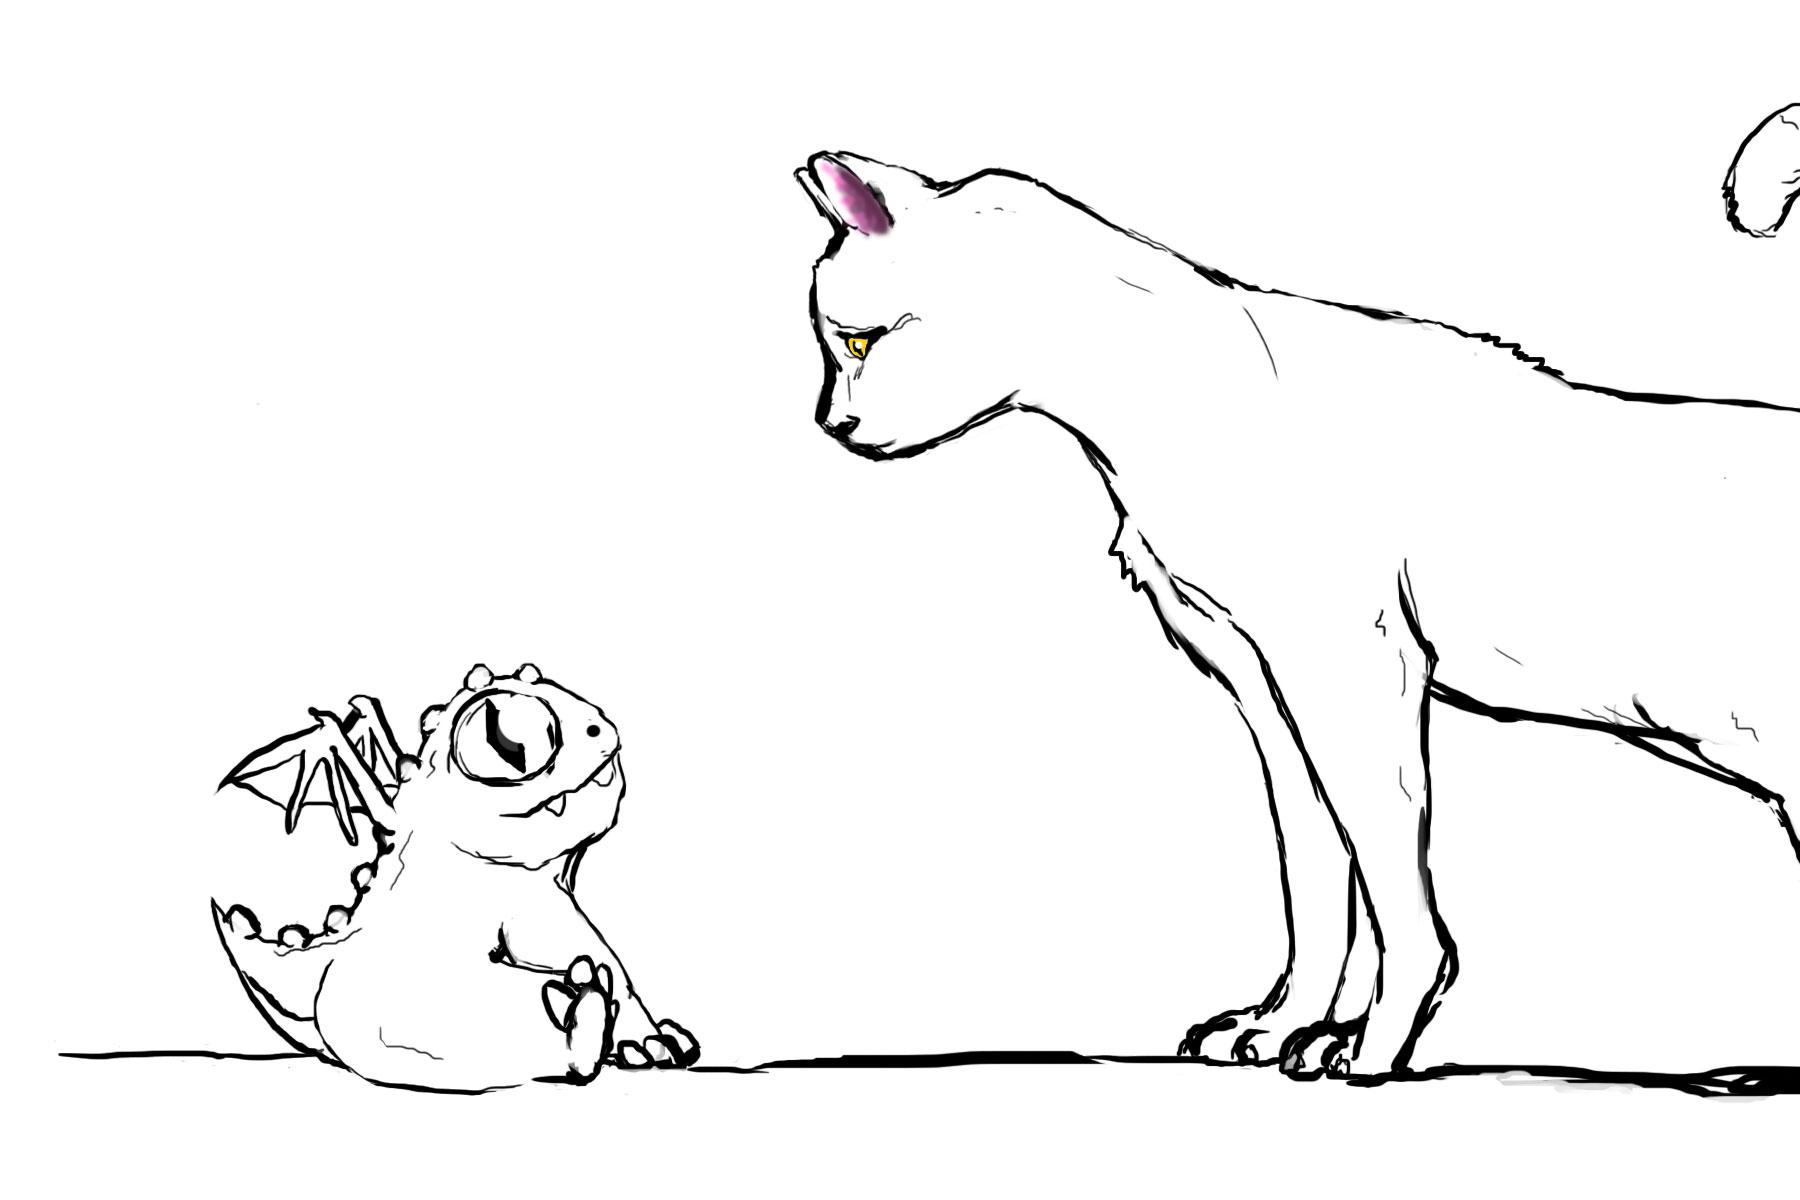 Cat vs Baby Dragon work in progress by EliasAdams on